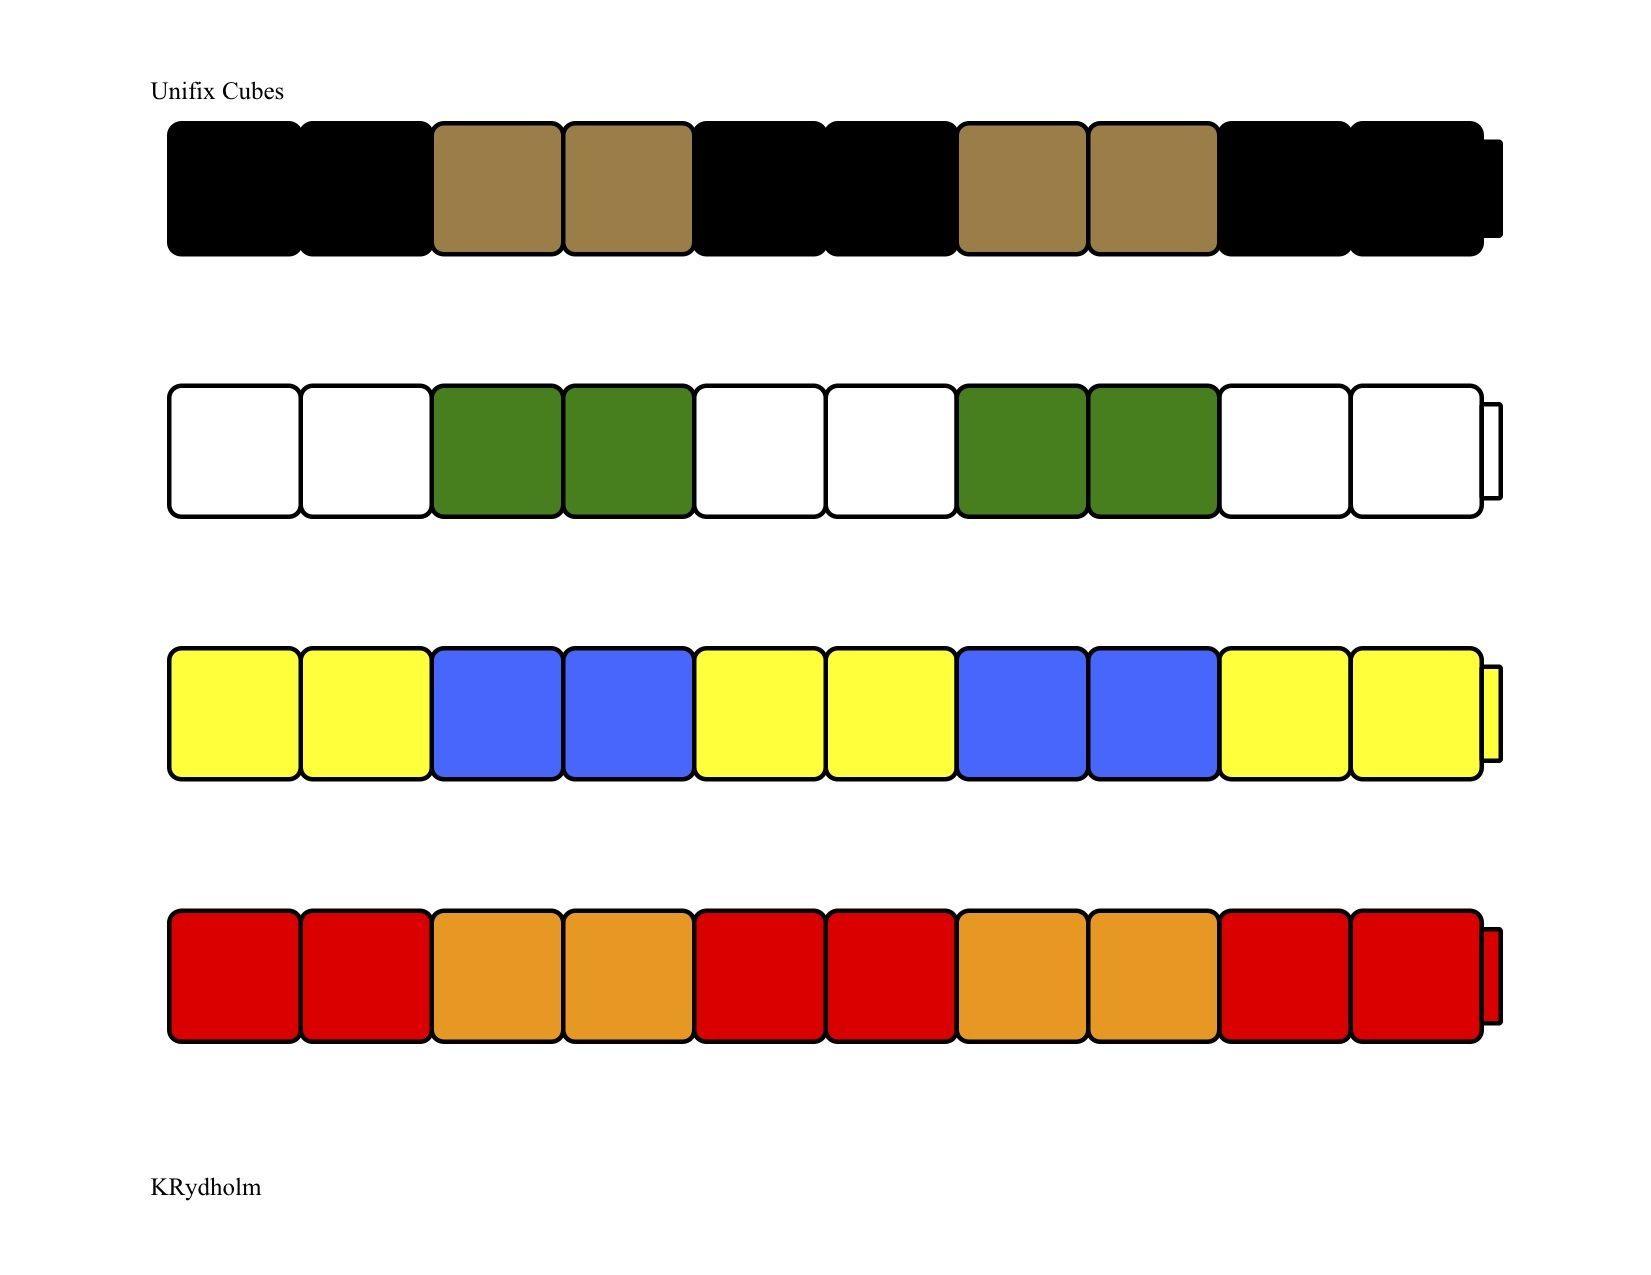 Unifix Patterns 2